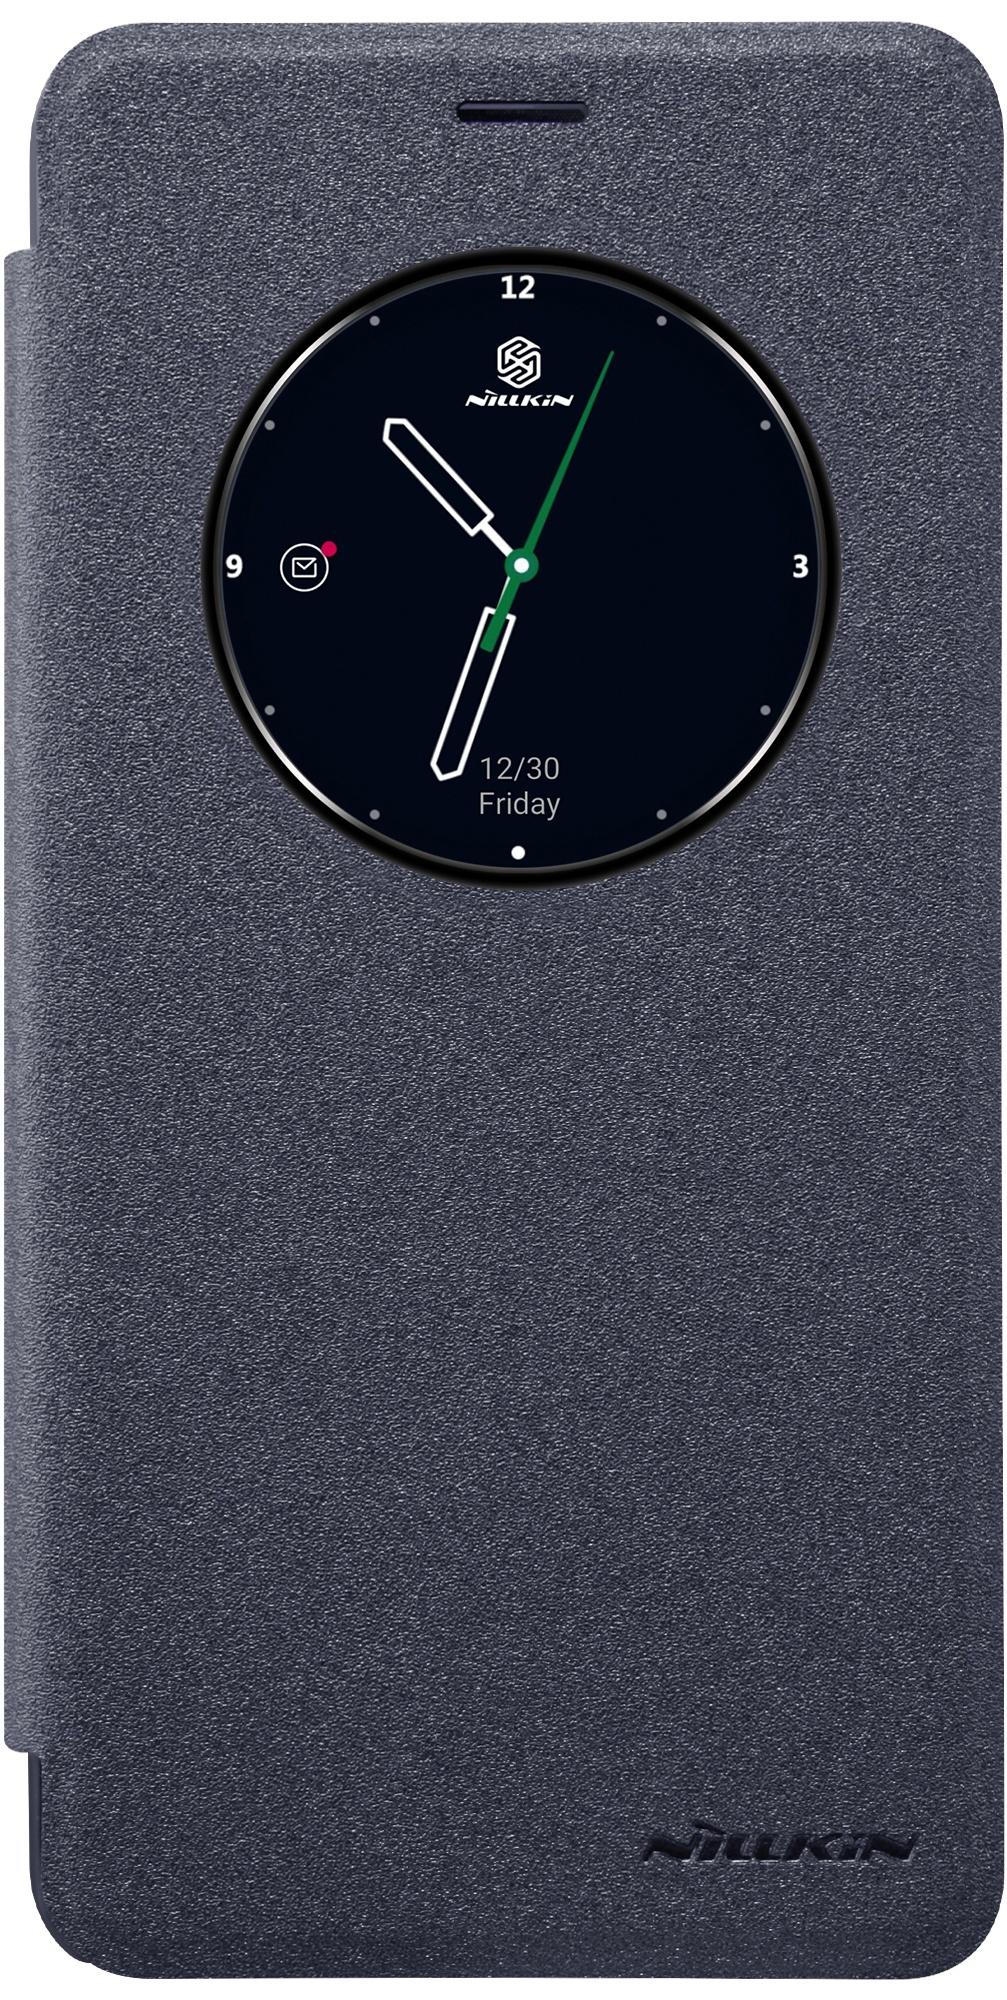 Чехол Nillkin Sparkle для Meizu M5 Note, 6902048135253, серый nillkin meizu pro7 матовый телефон защитная крышка чехол чехол для мобильного телефона черный